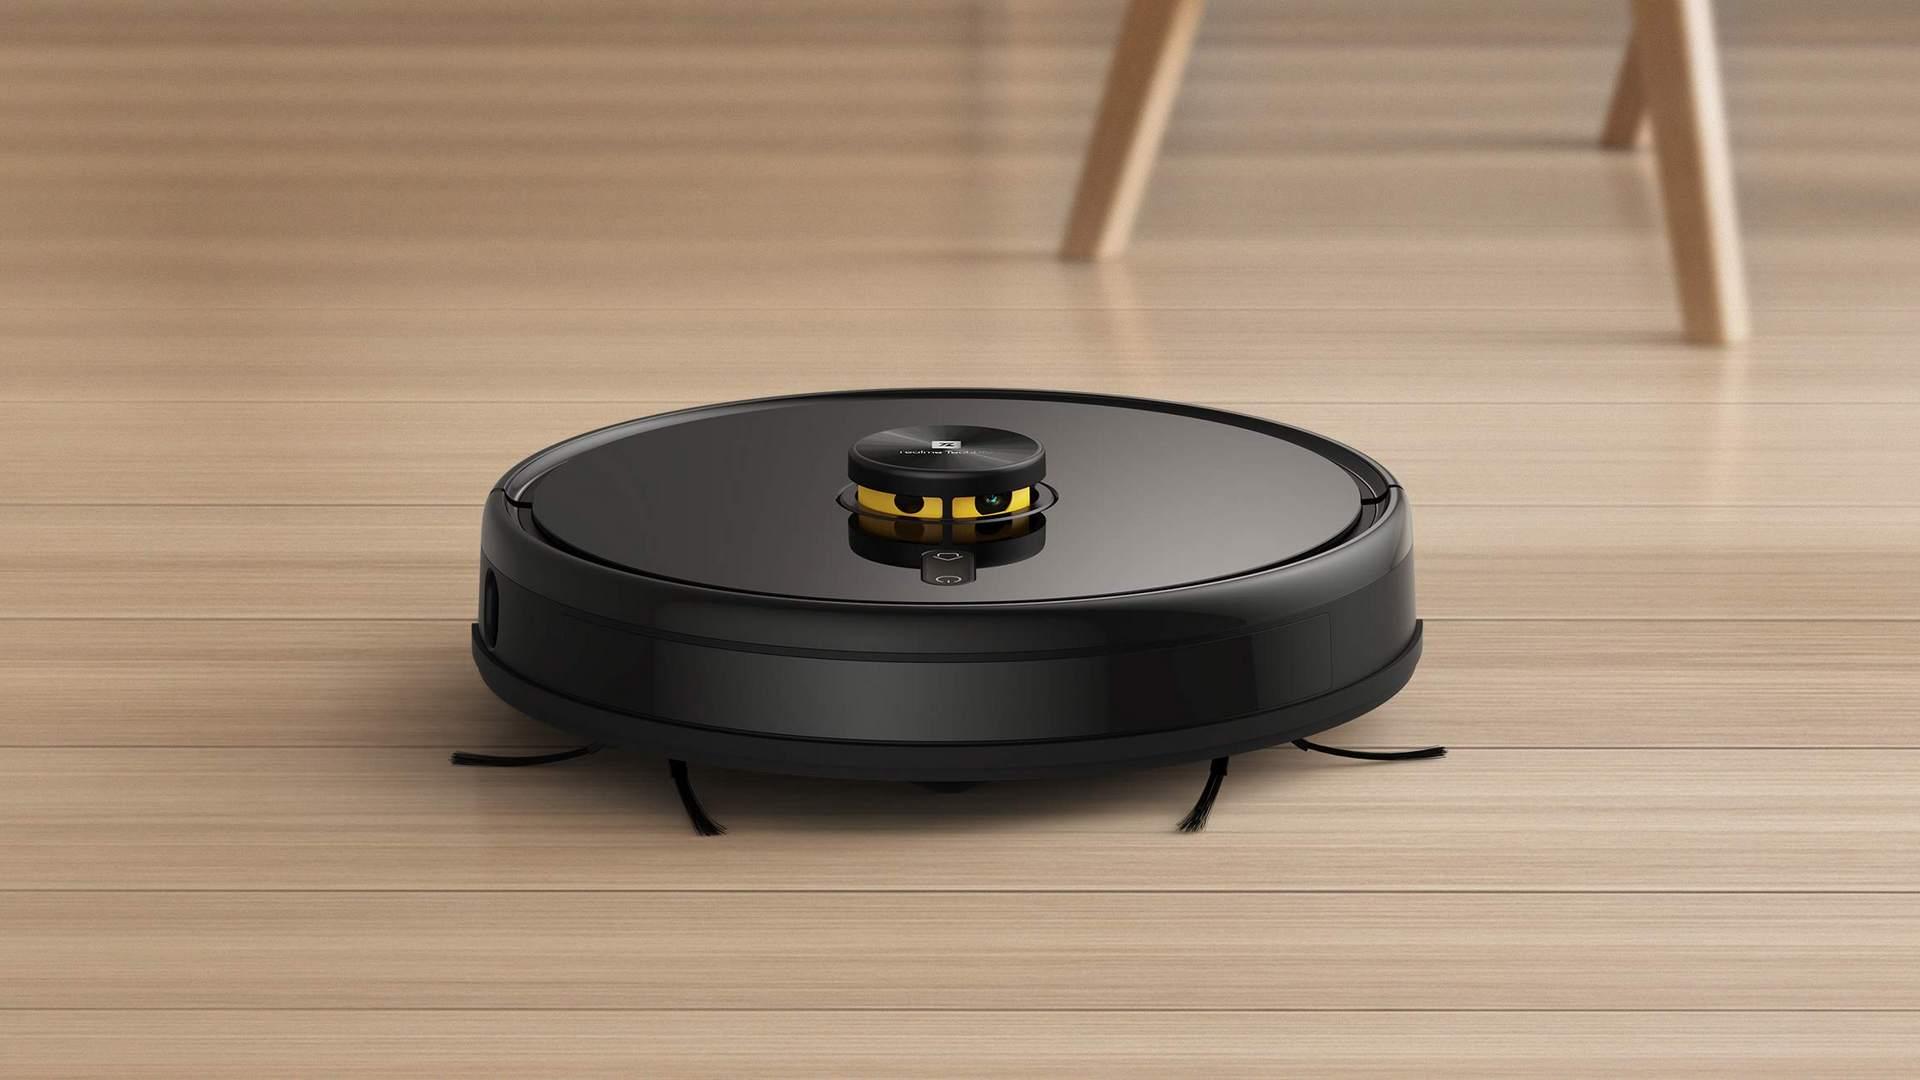 Realme TechLife Robot Vacuum Cleaner – AliExpress